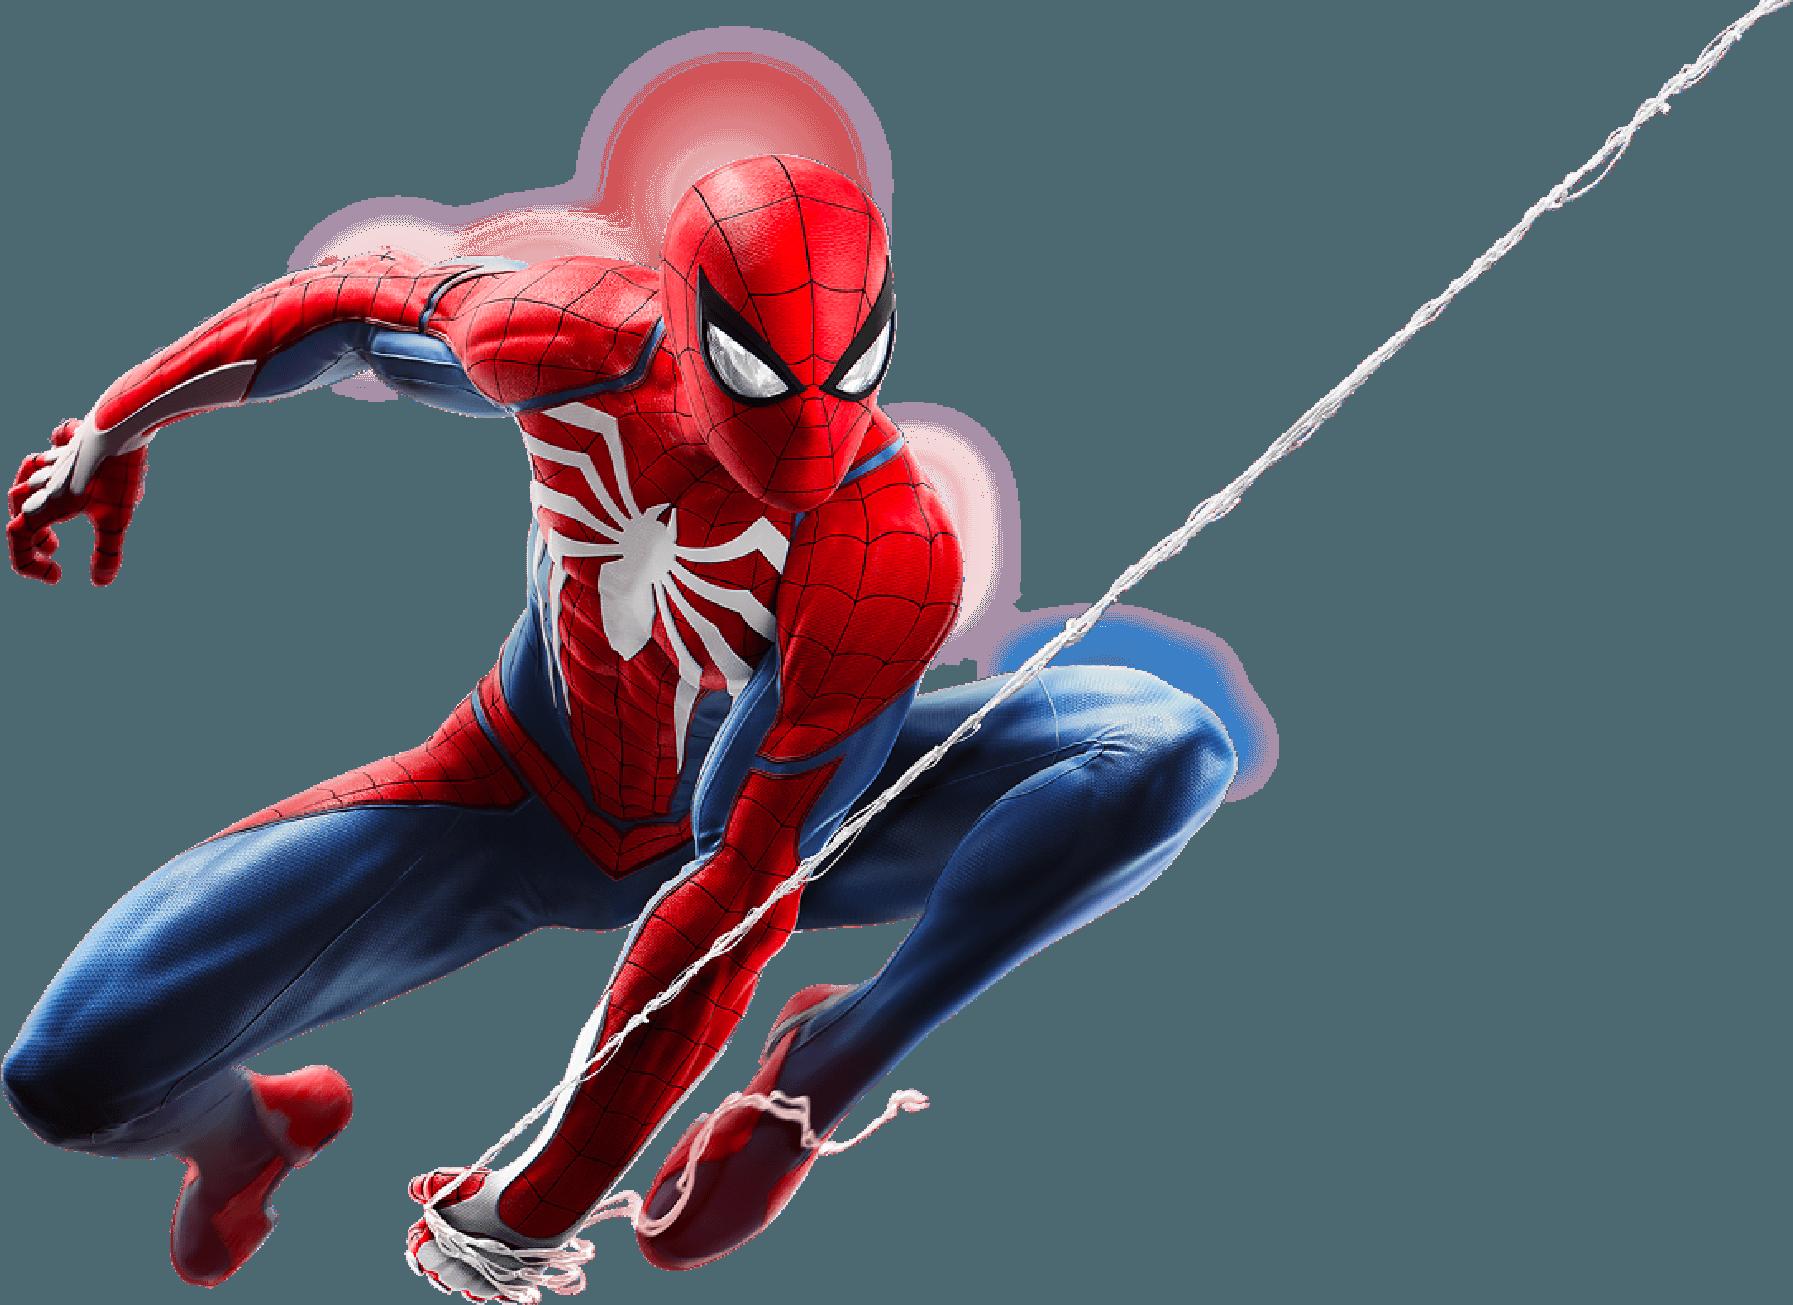 Spider-Man Gaming Displays Printed Stands Background